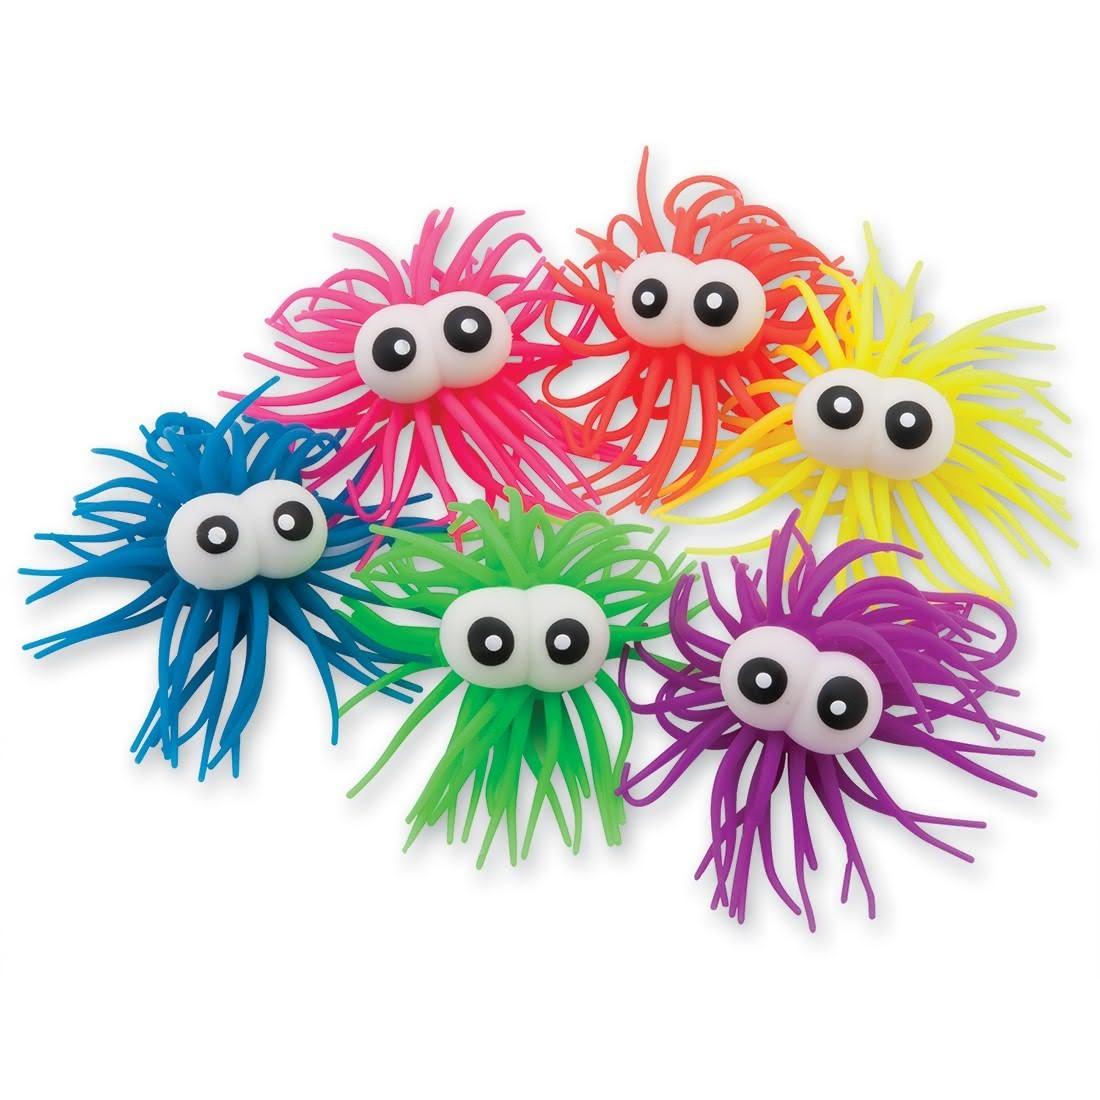 Blinking Hair Balls [image]